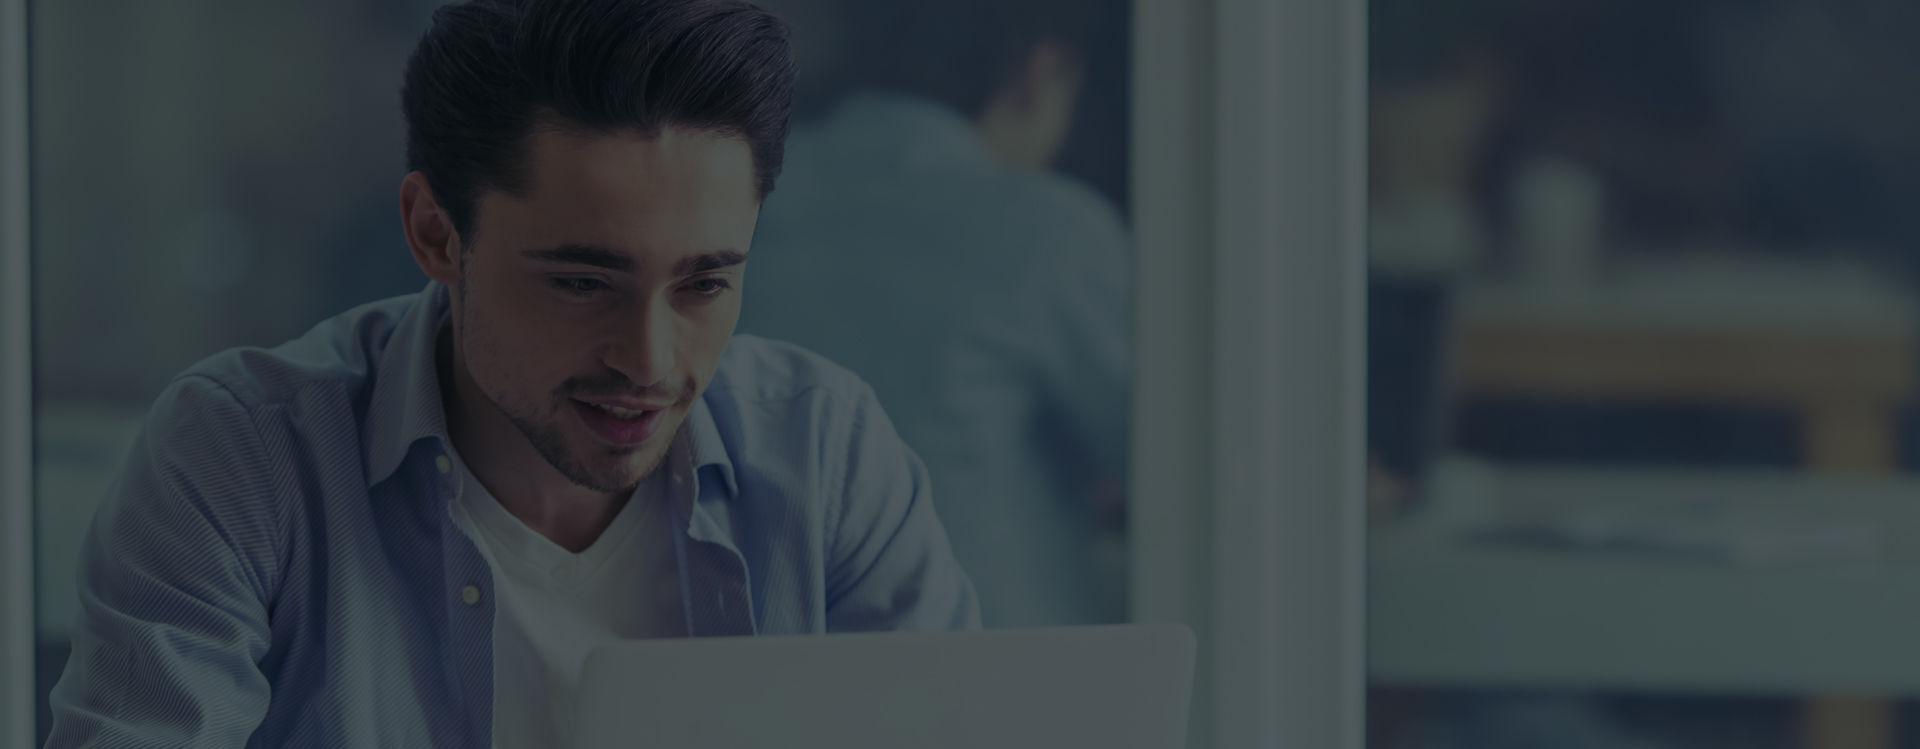 Club Z! Tutors - Online Tutoring, In-Home Tutoring & Instant Tutoring